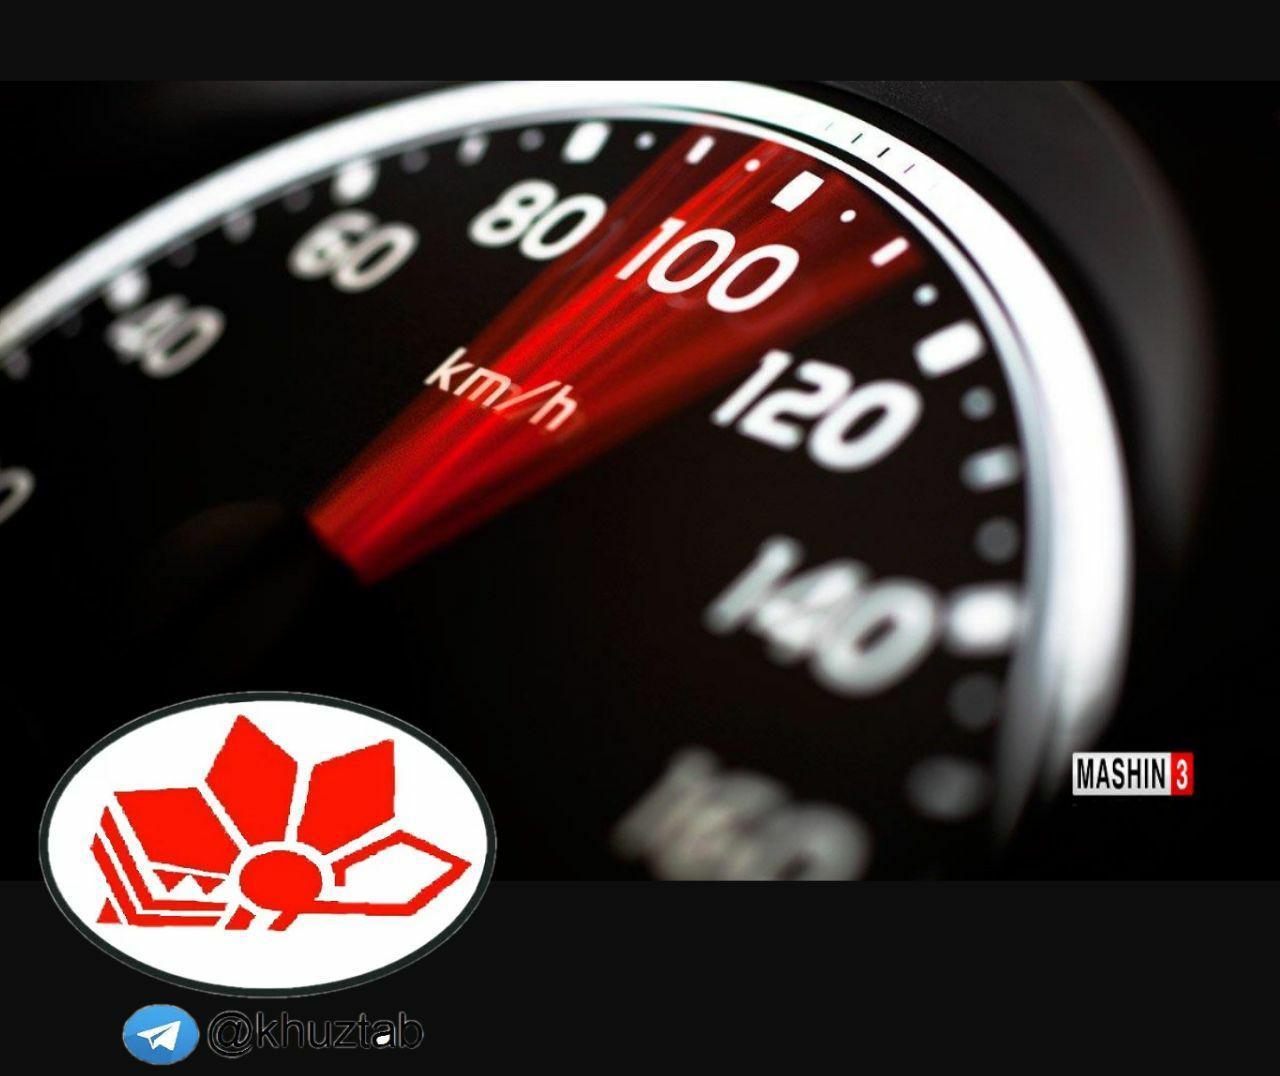 photo ۲۰۱۷ ۱۱ ۲۹ ۰۹ ۱۰ ۱۹ کاهش سقف سرعت مجاز در کشور